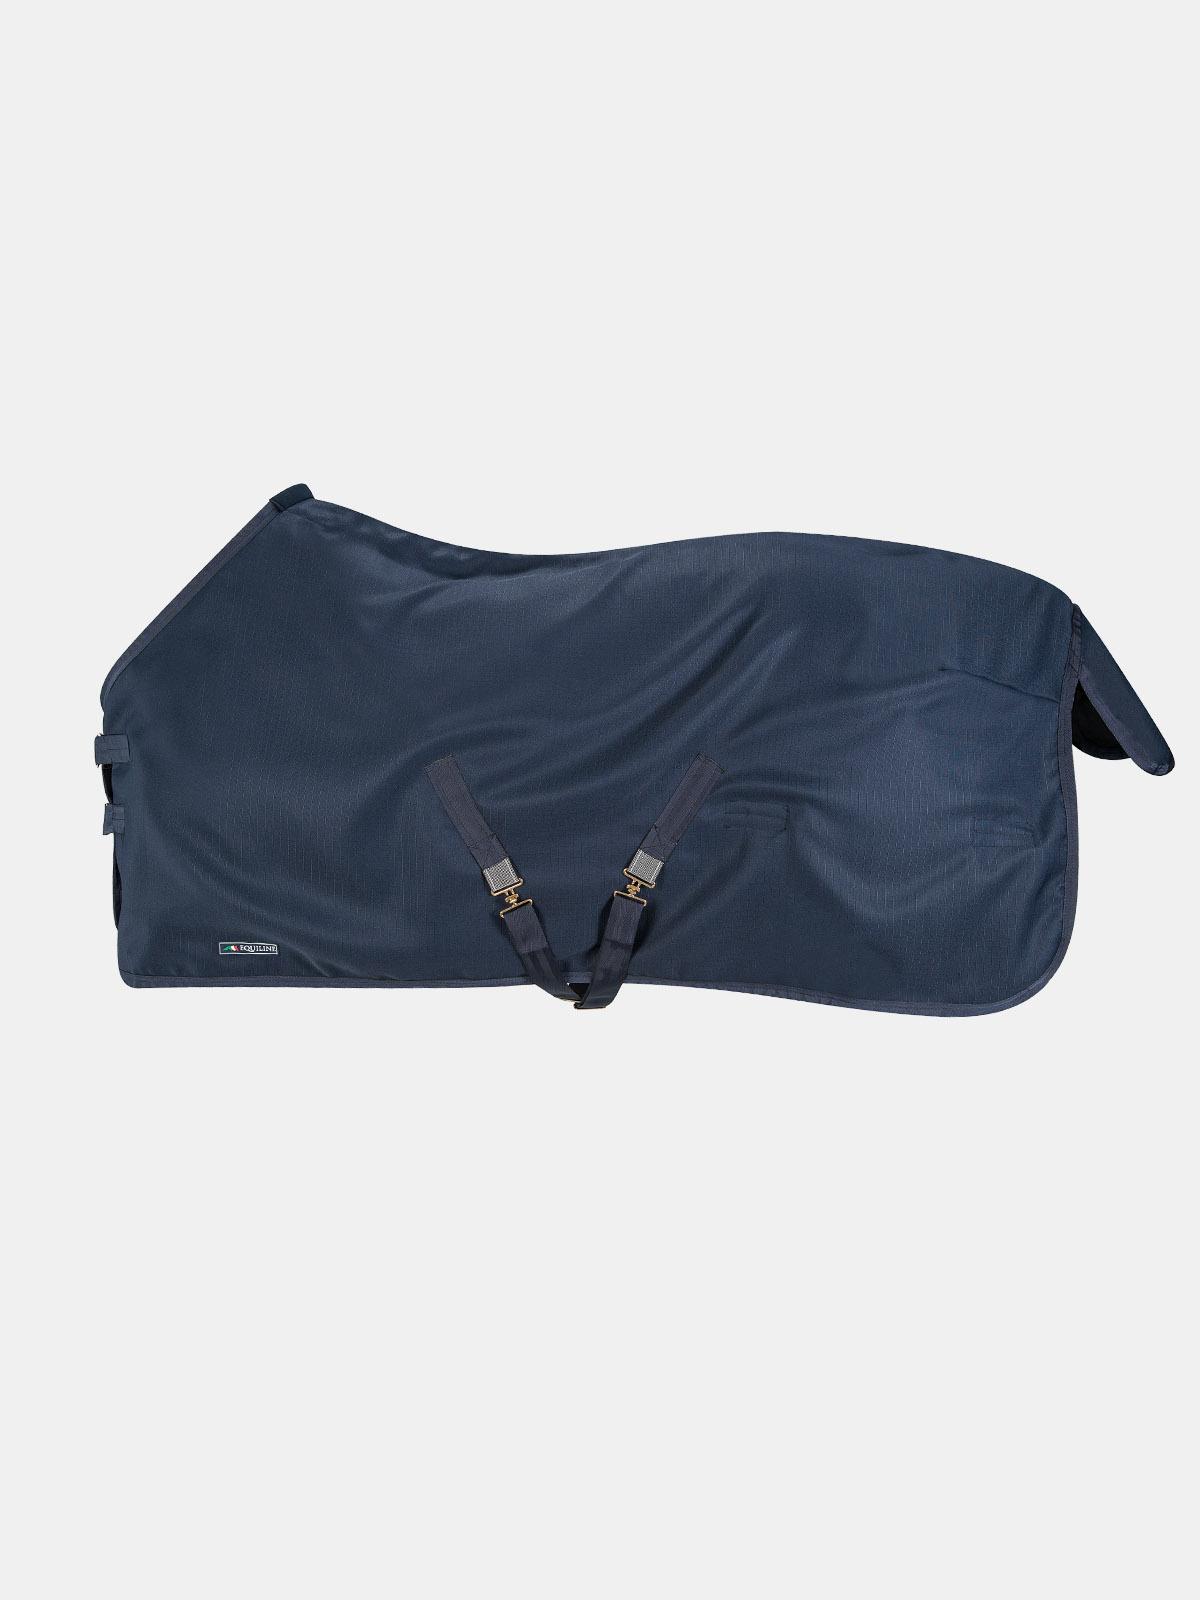 ATLANTA - Heavy Weight Stable Blanket 2